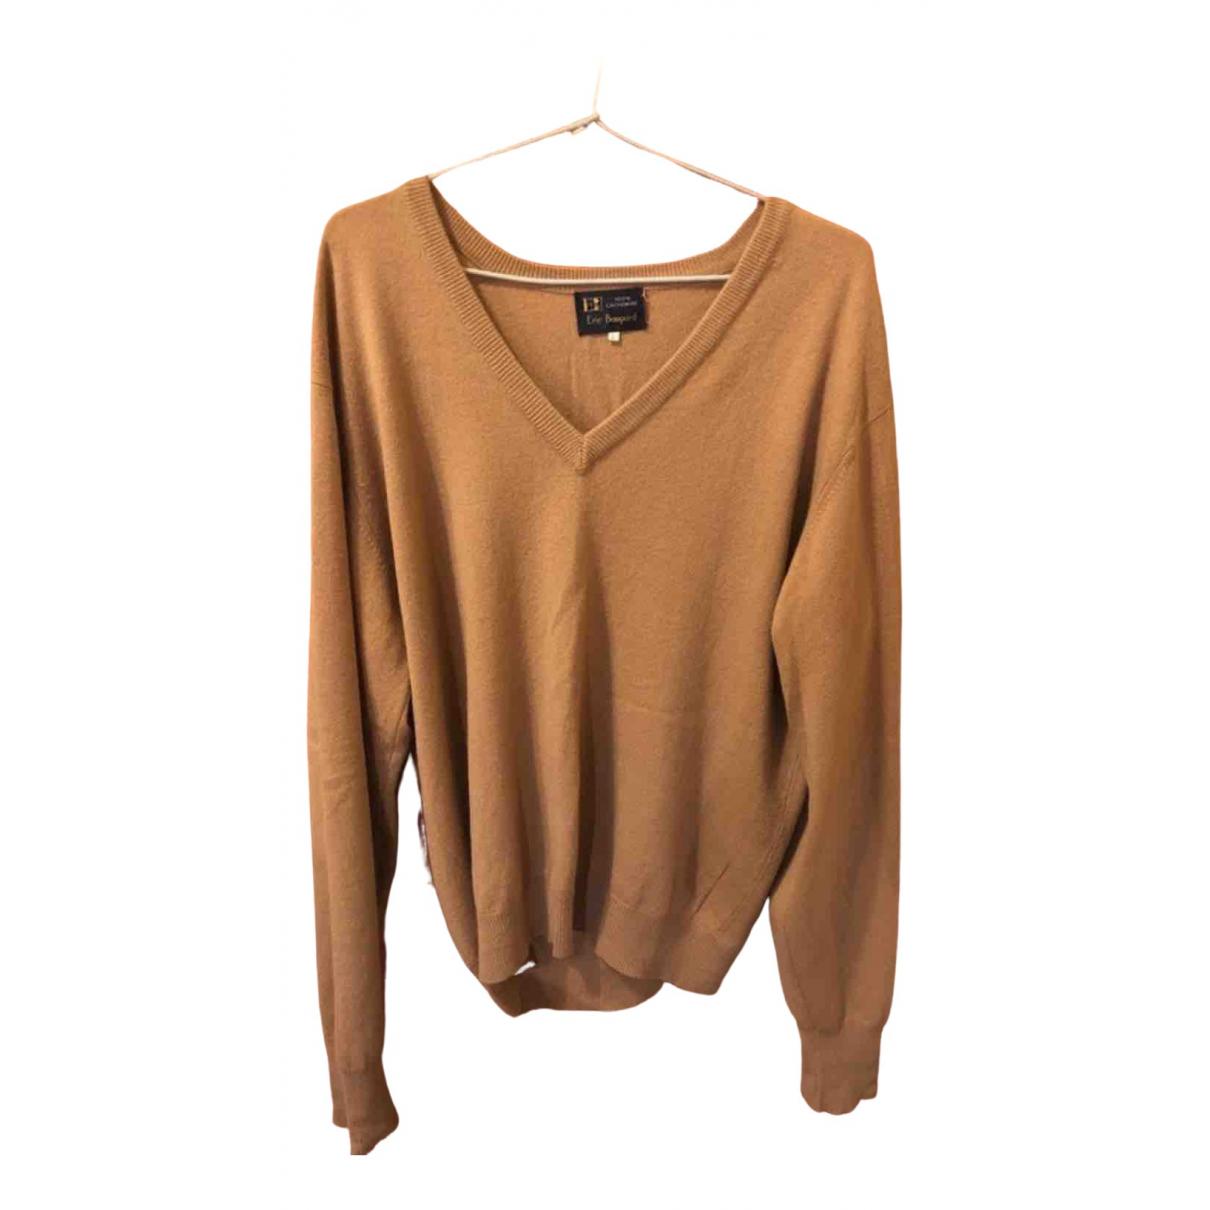 Eric Bompard \N Camel Cashmere Knitwear & Sweatshirts for Men L International